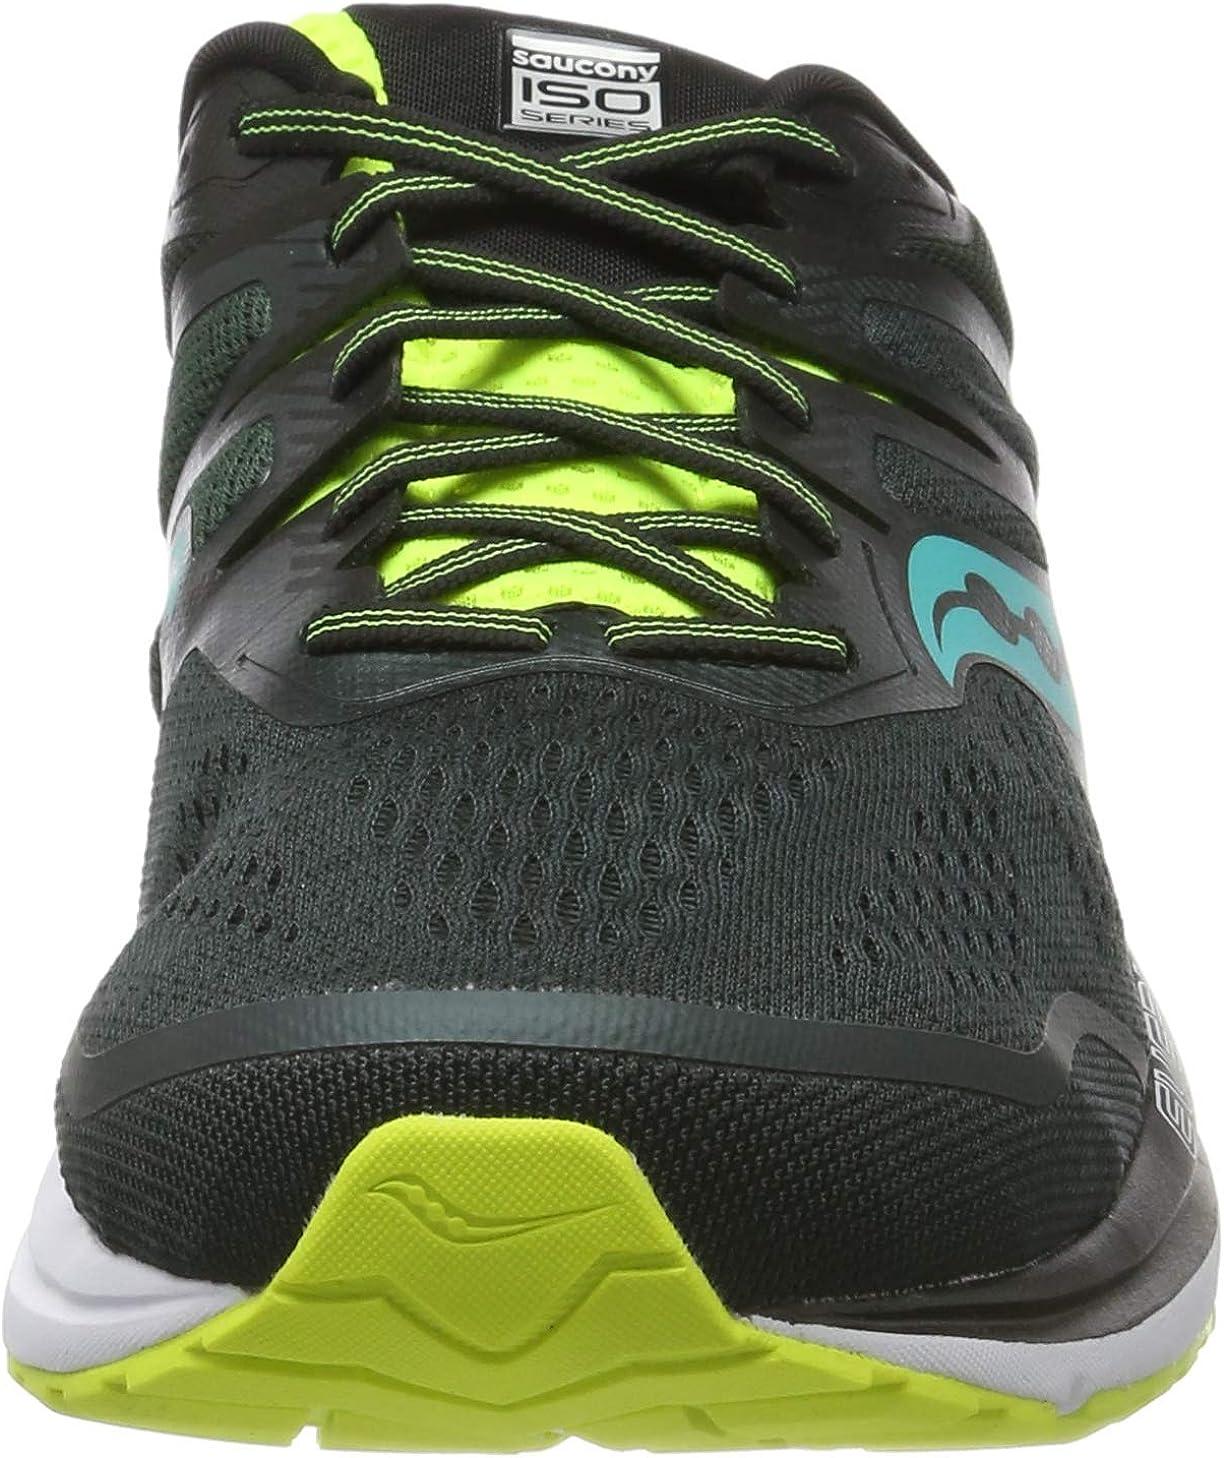 Saucony Mens Omni Iso 2 Running Shoe